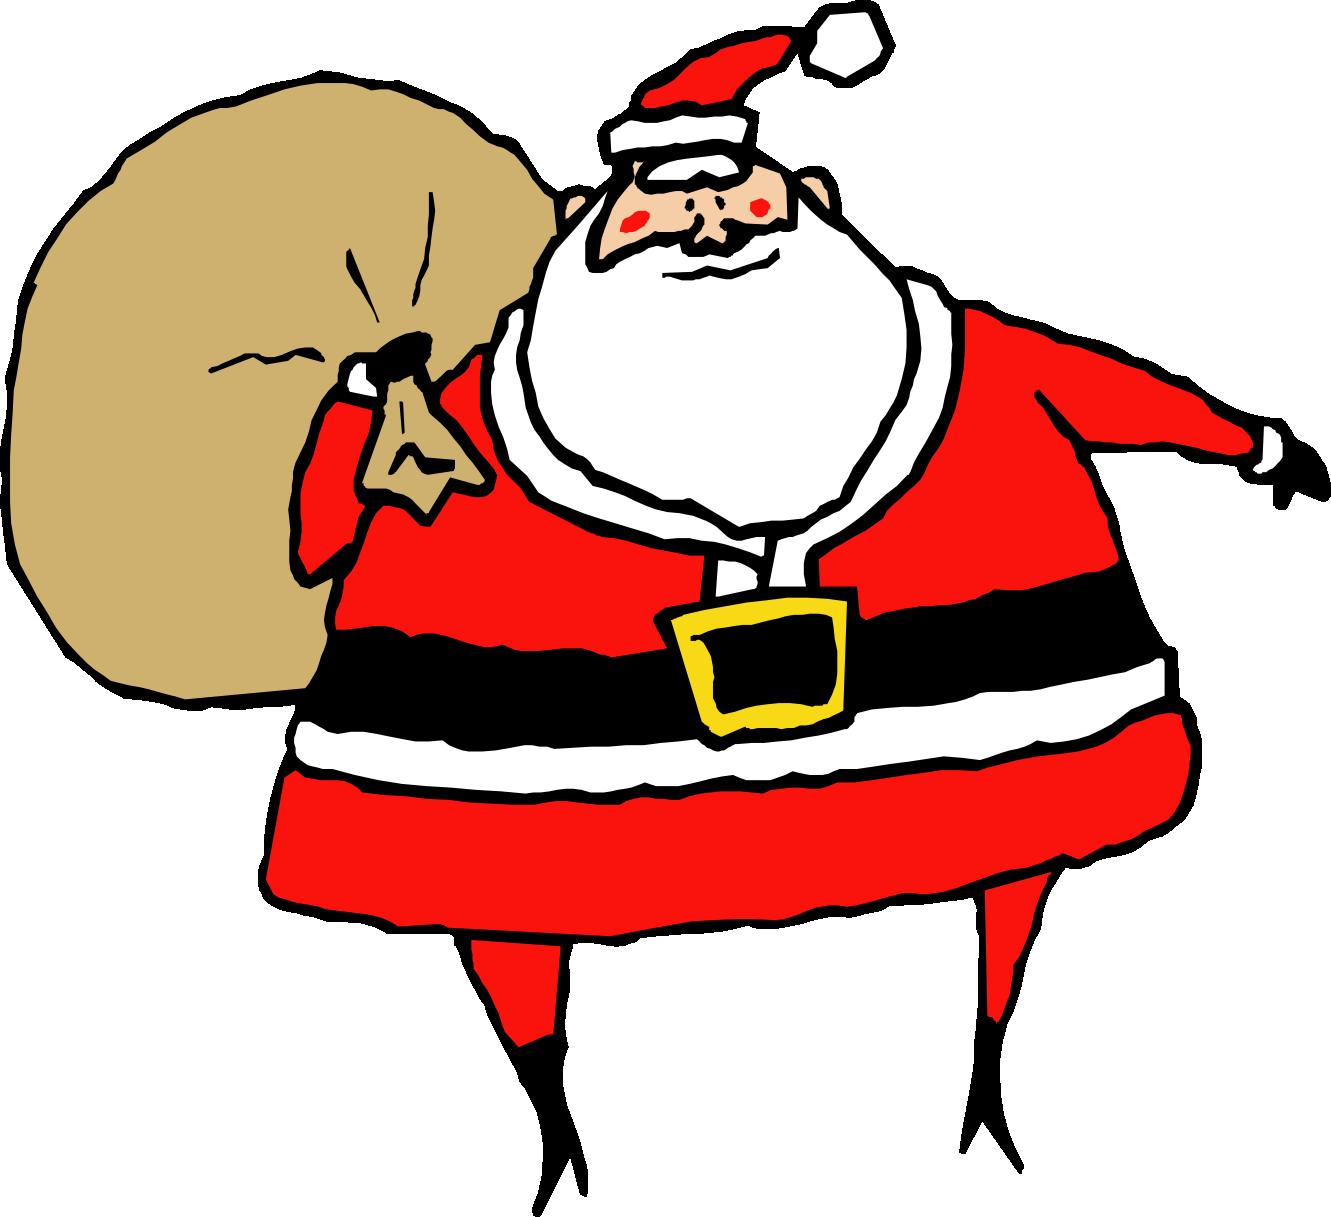 Santa legs clipart clip art freeuse download Free Animated Santa Claus Clipart, Download Free Clip Art, Free Clip ... clip art freeuse download